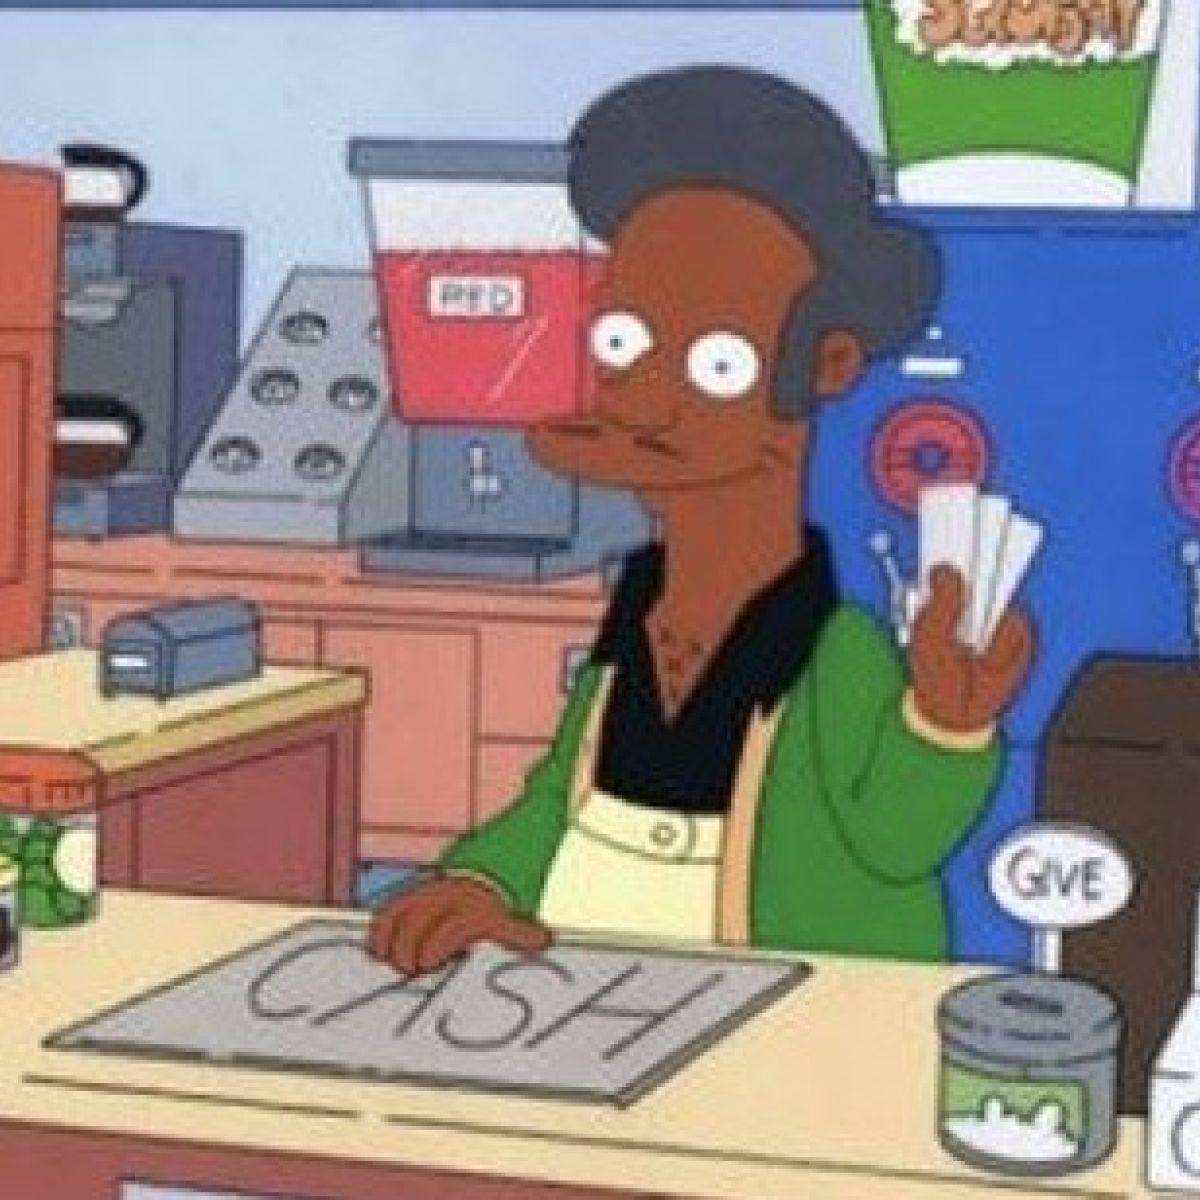 The Simpsons Drop Indian Character Apu Over Racial Backlash